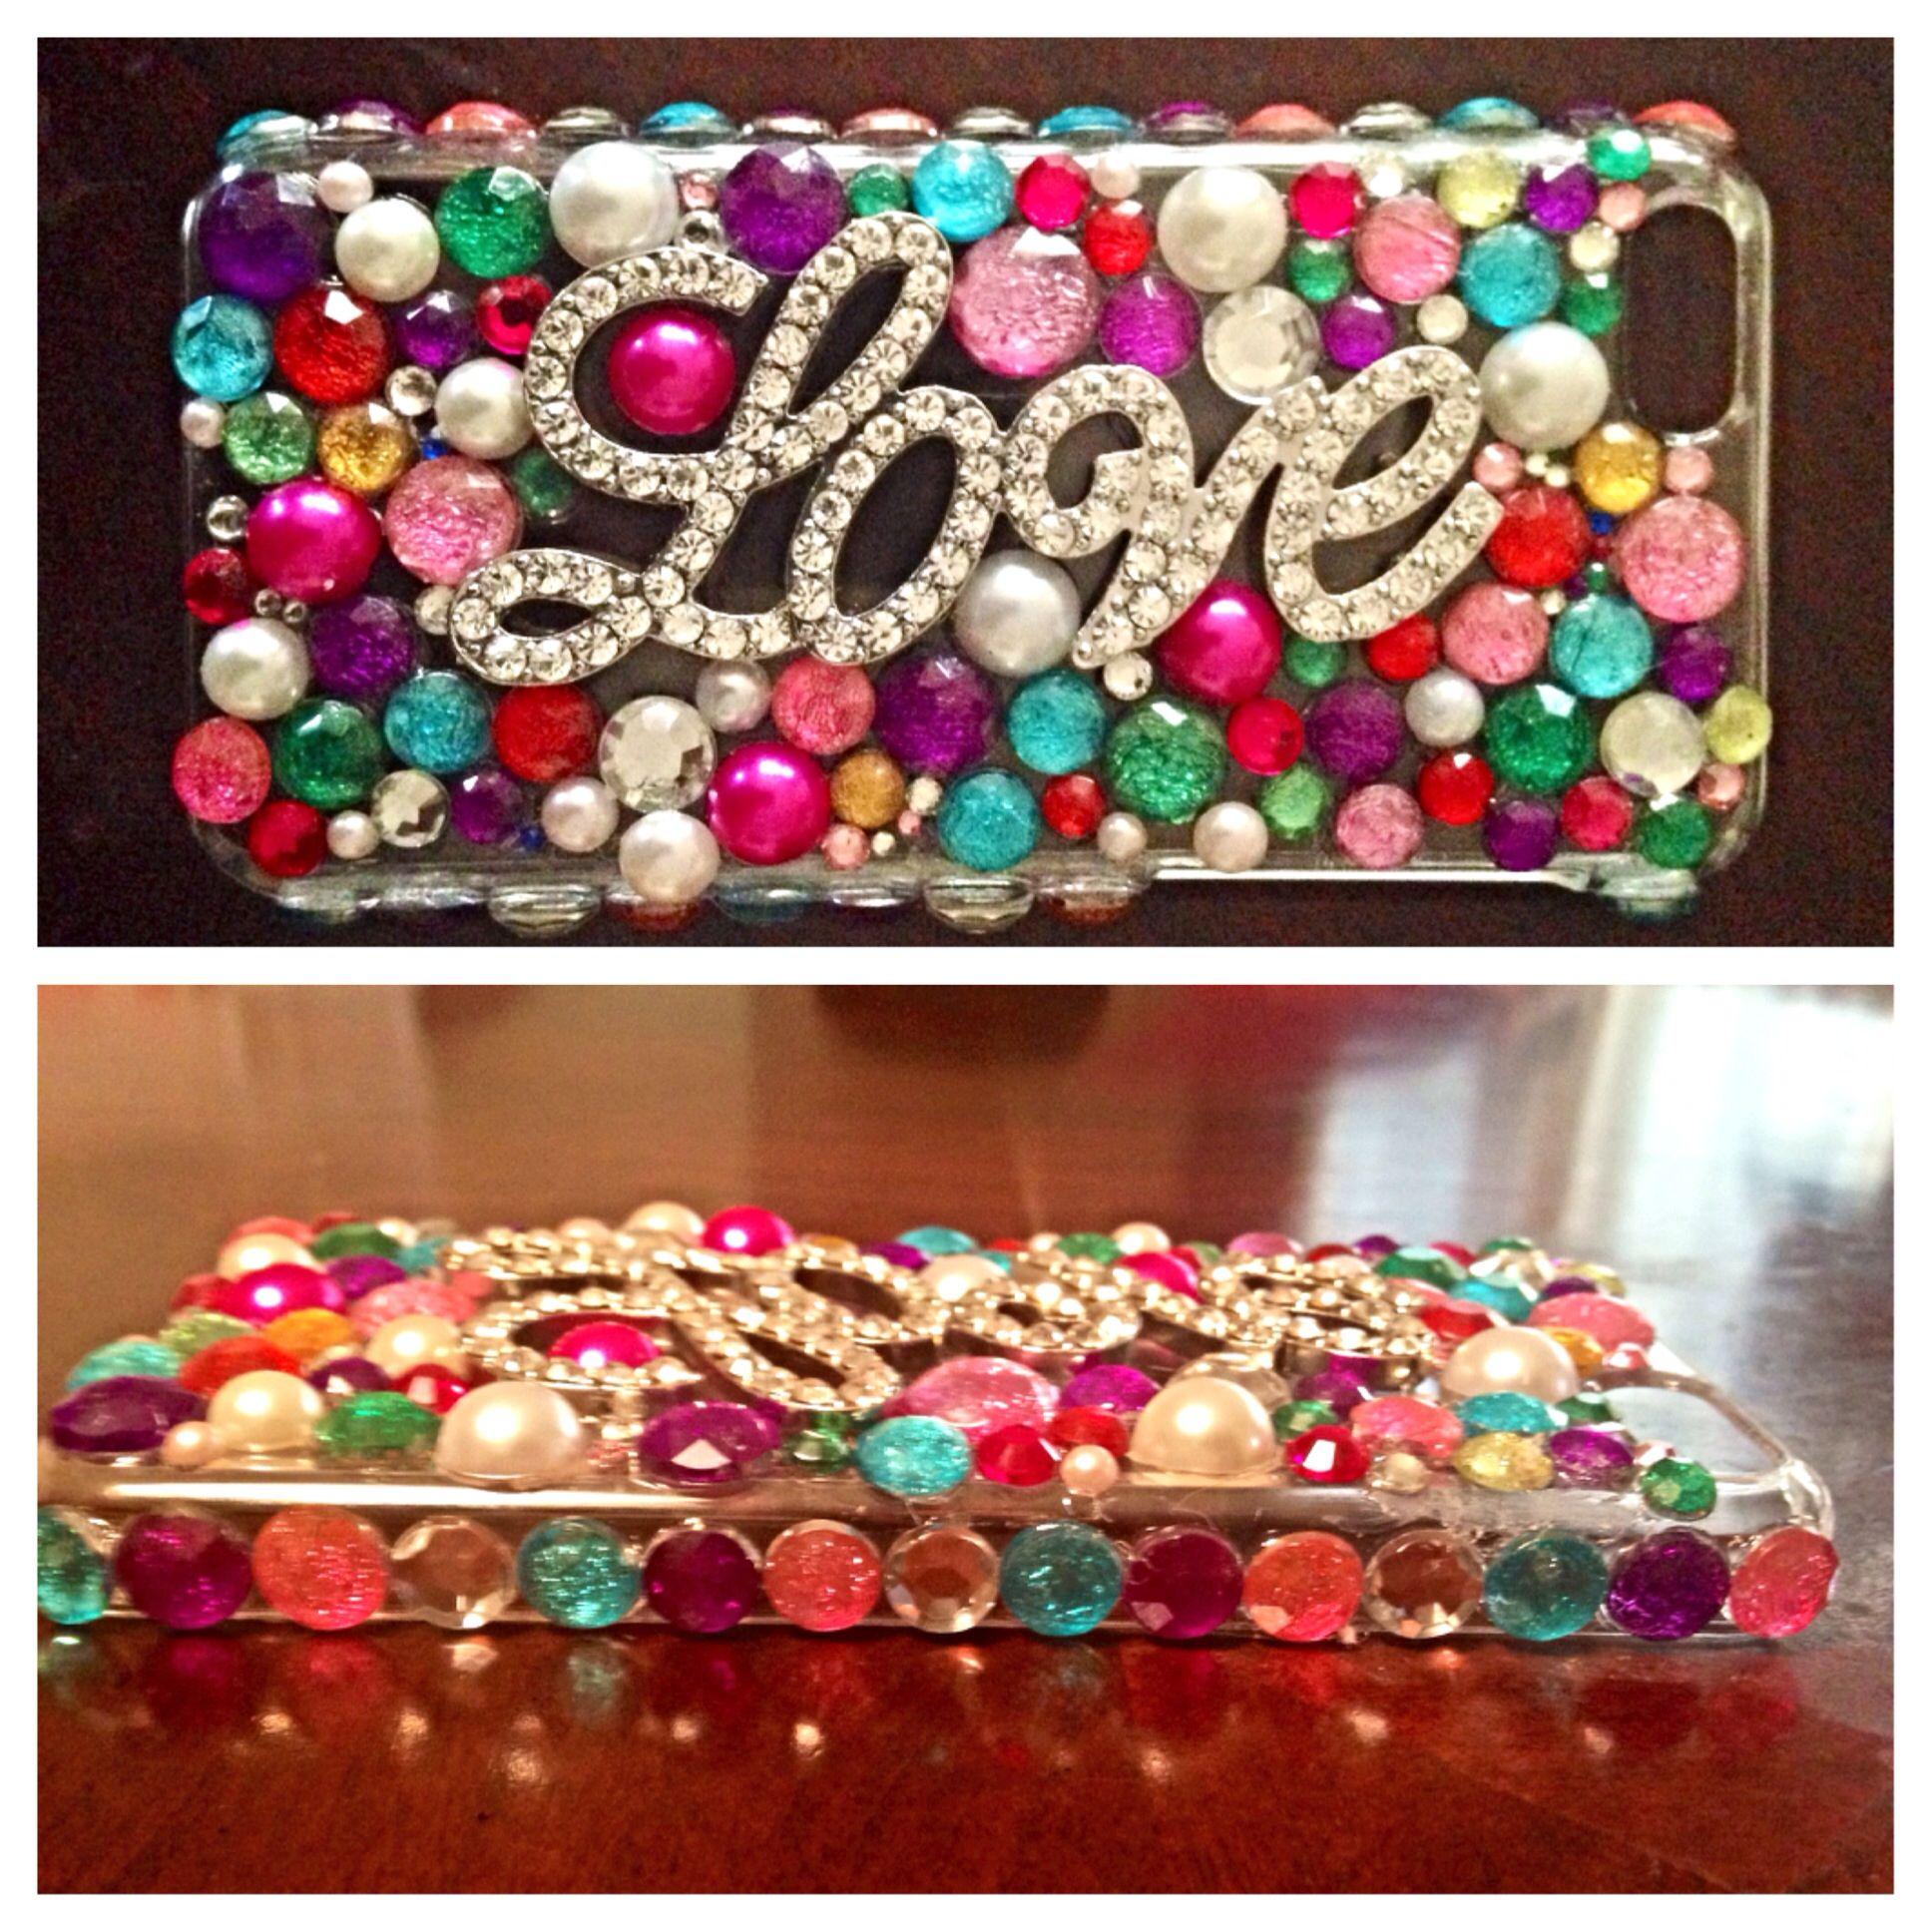 New iPhone 5c case :) #Love